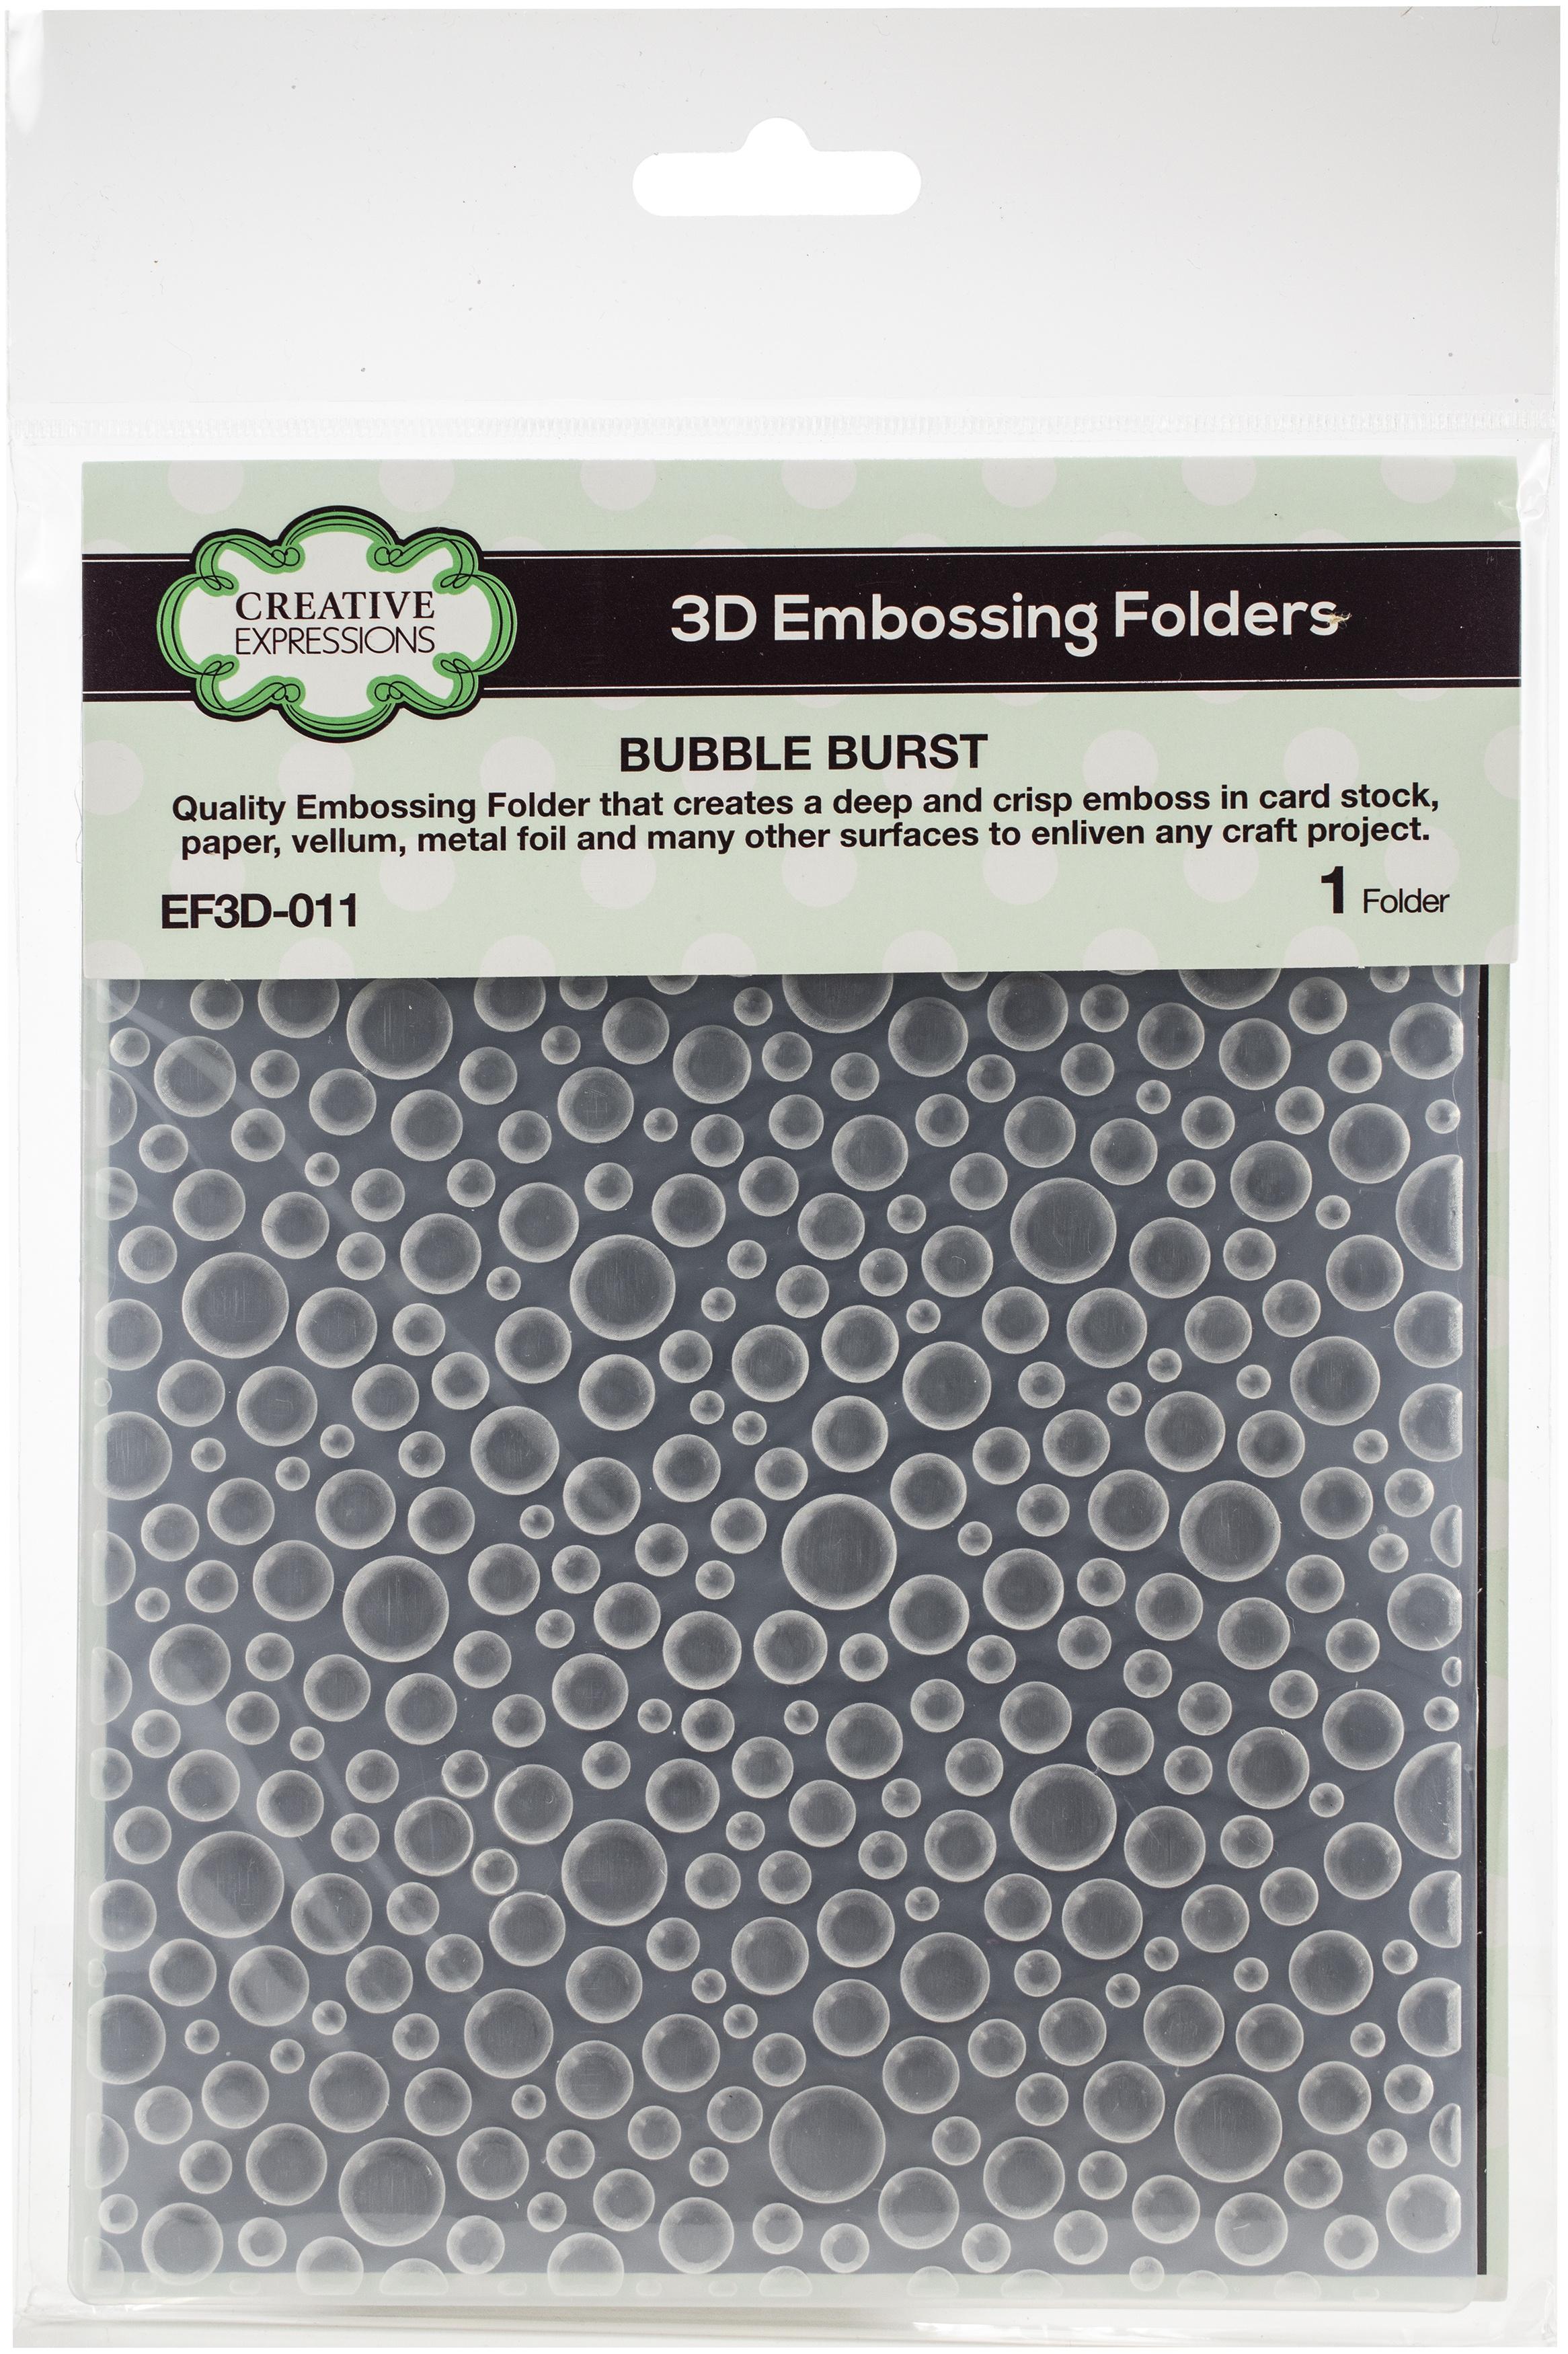 Creative Expressions 3D Embossing Folder 5.75X7.5-Bubble Burst